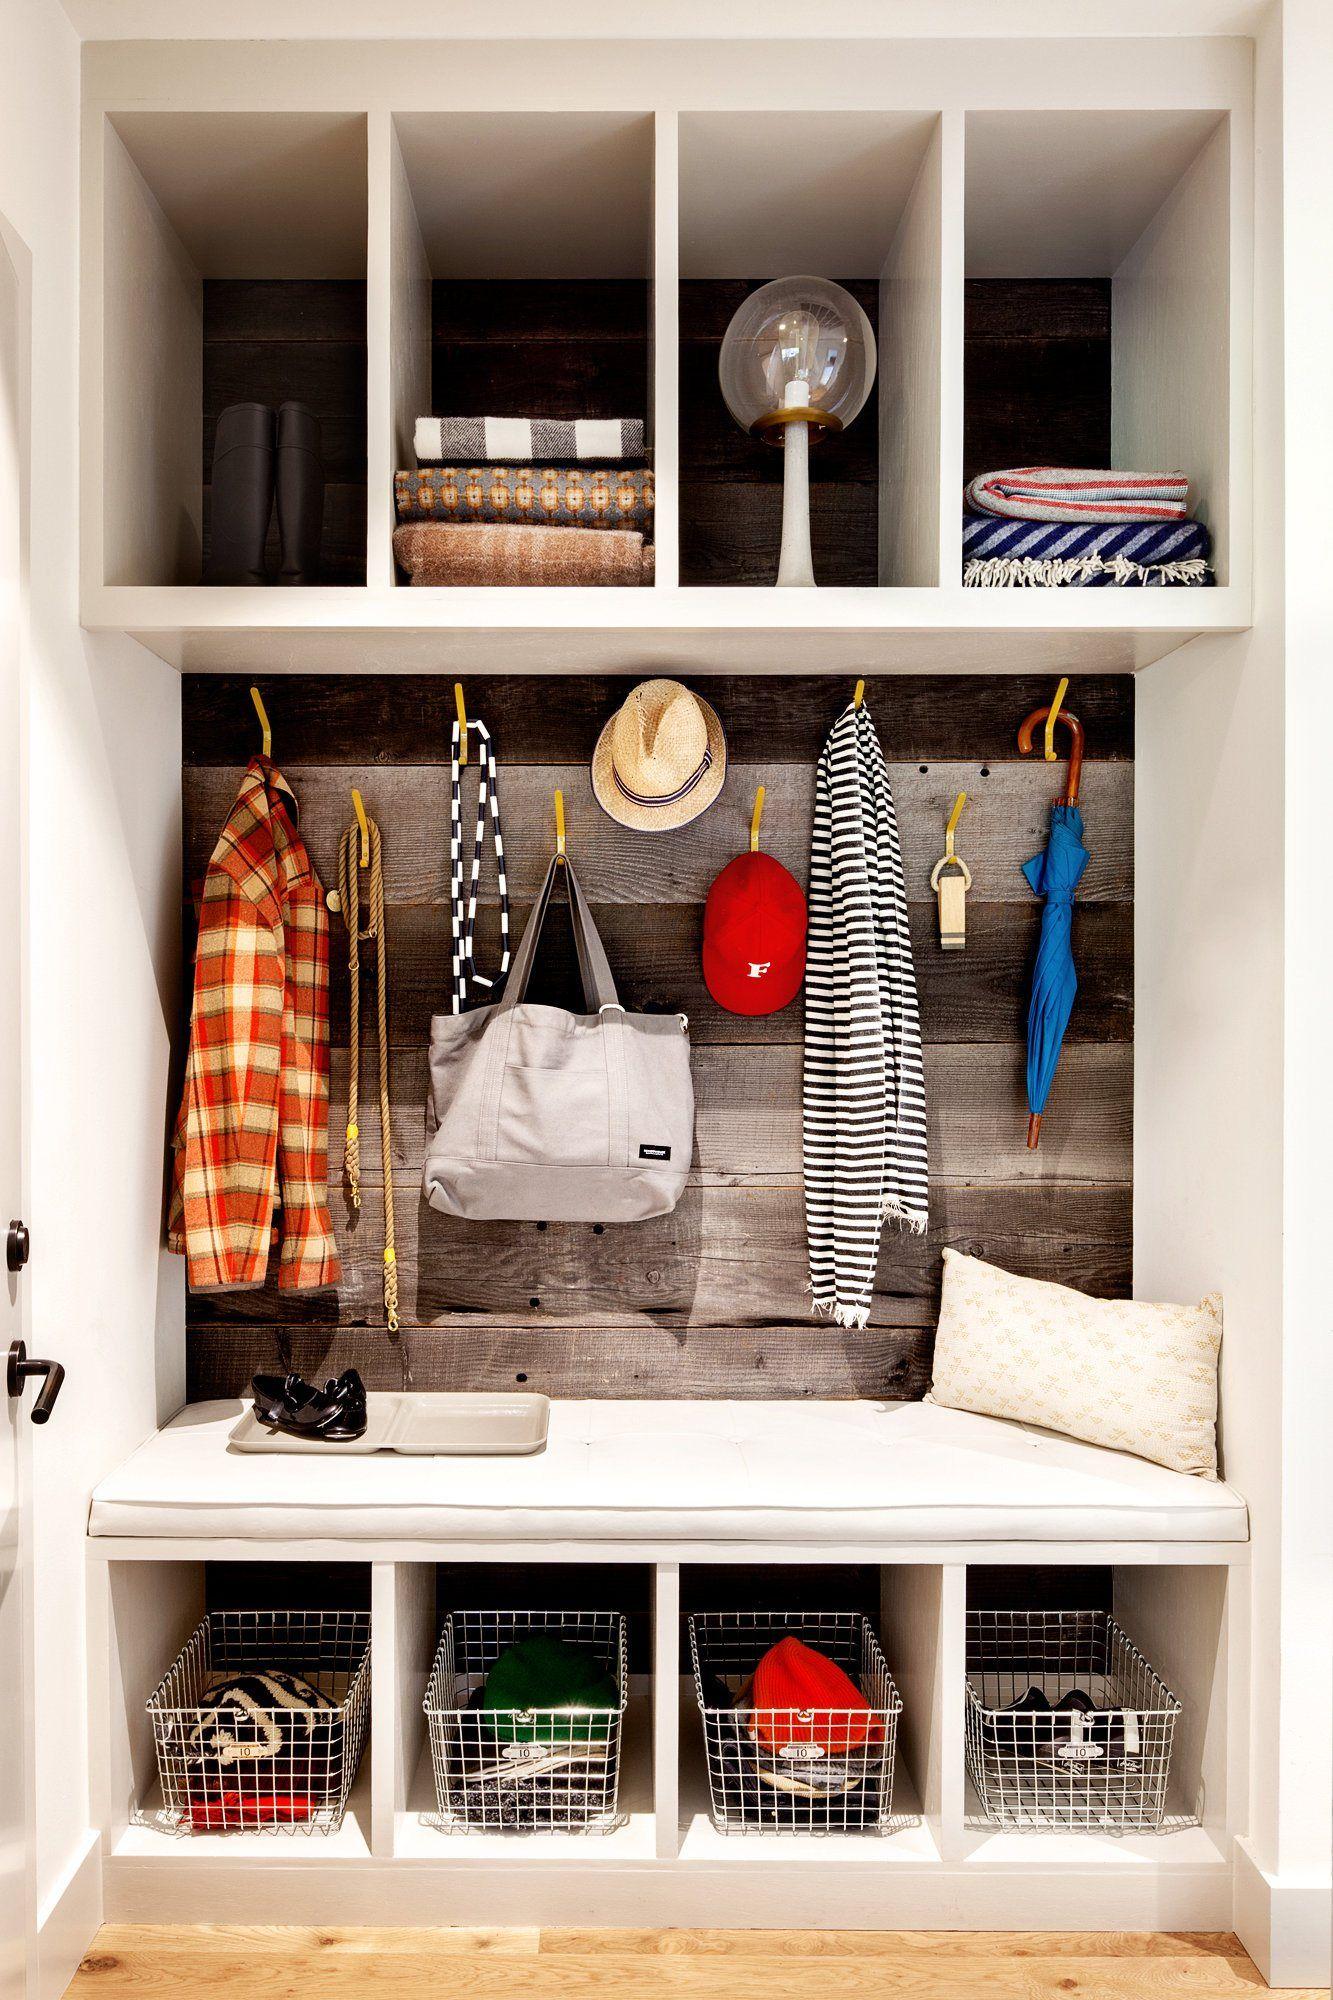 Modern hallway storage ideas  Mudroom storage  entrees  Pinterest  Mudroom Storage and Banquettes